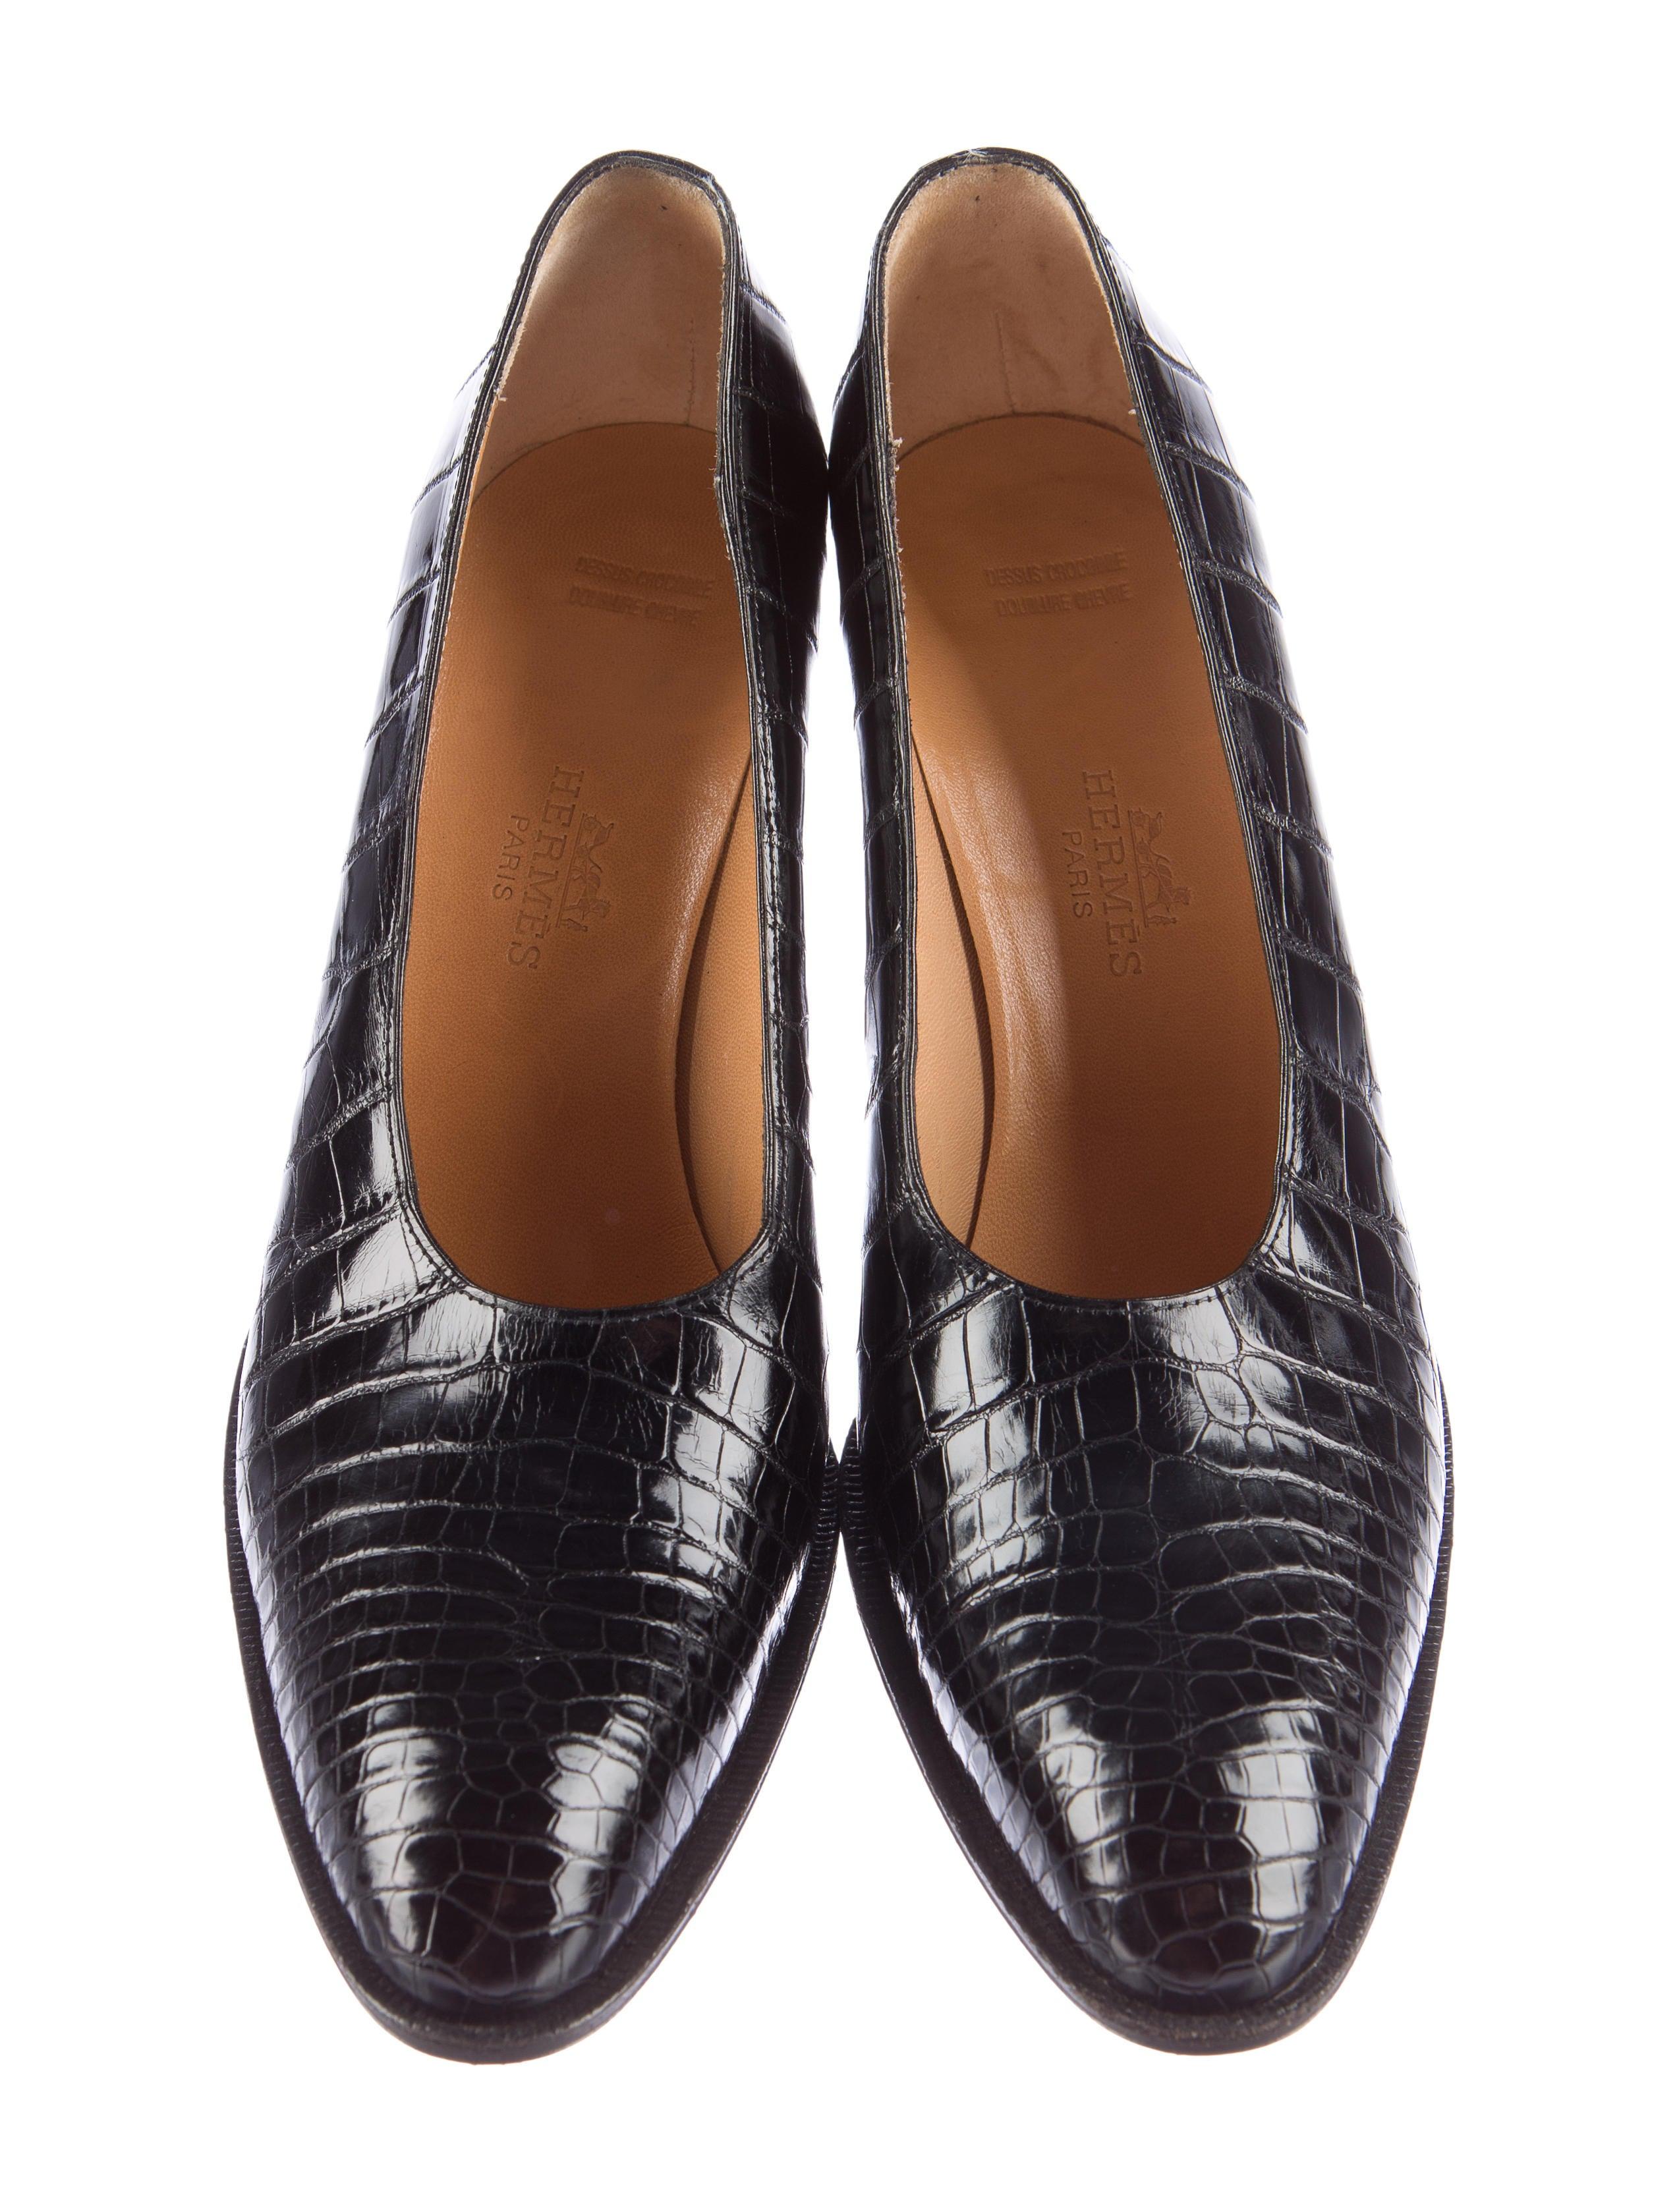 hermes women shoes - photo #39